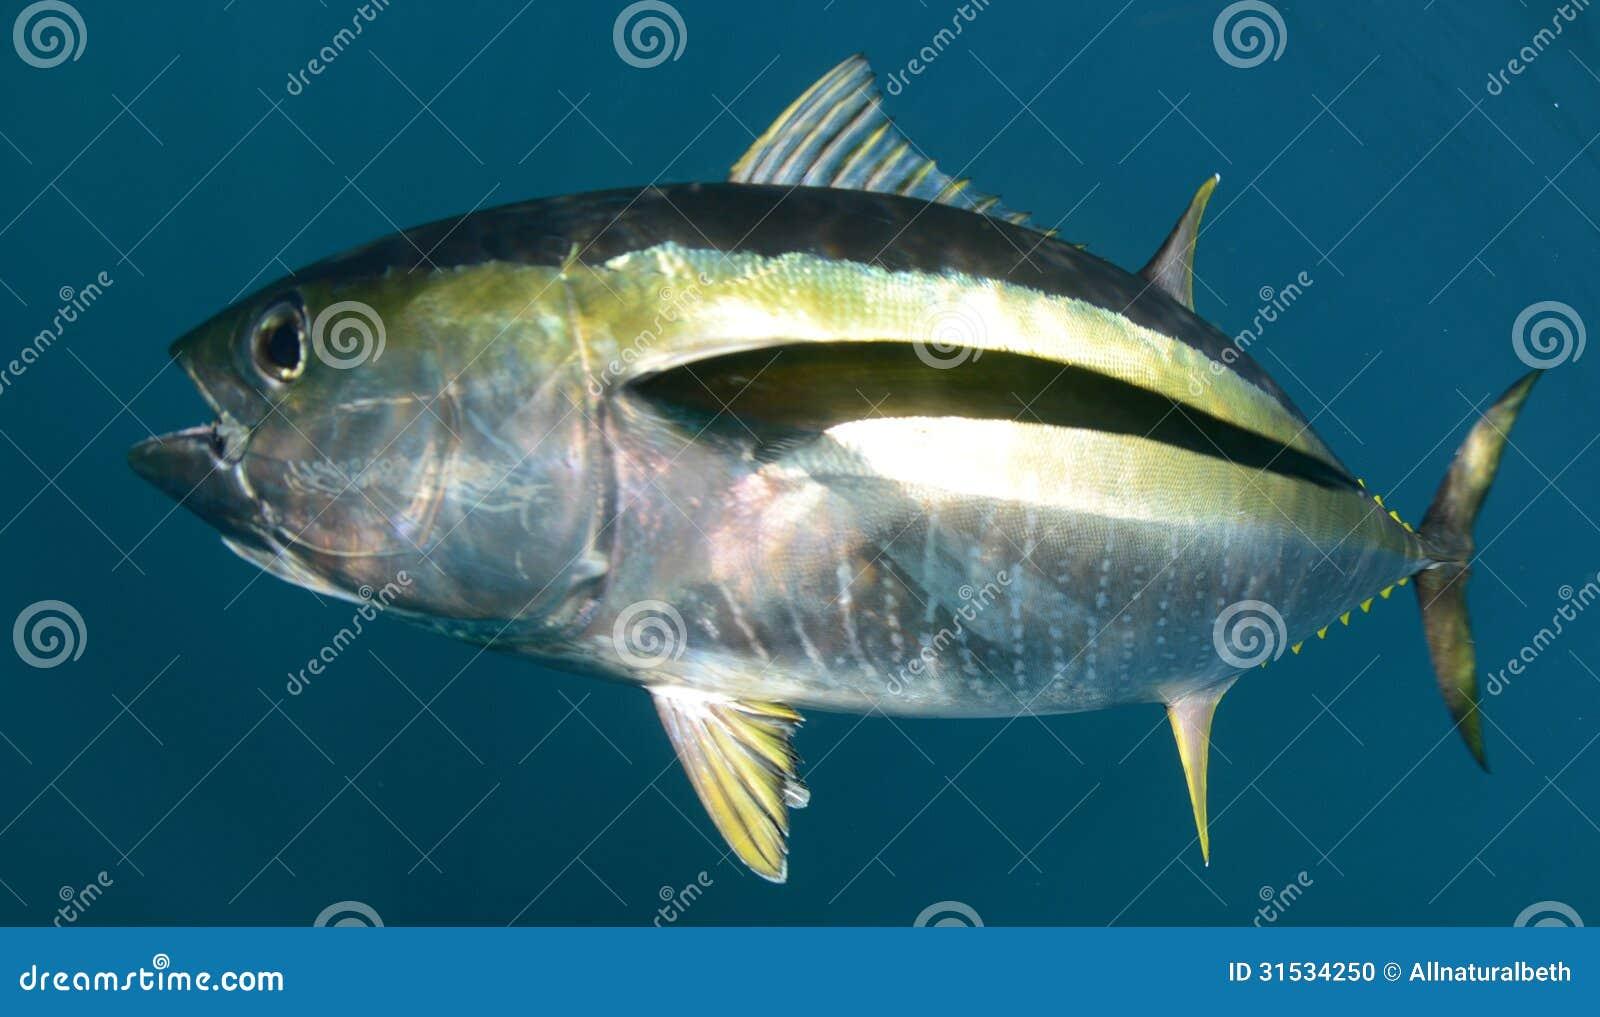 Yellowfin tuna fish underwater in ocean